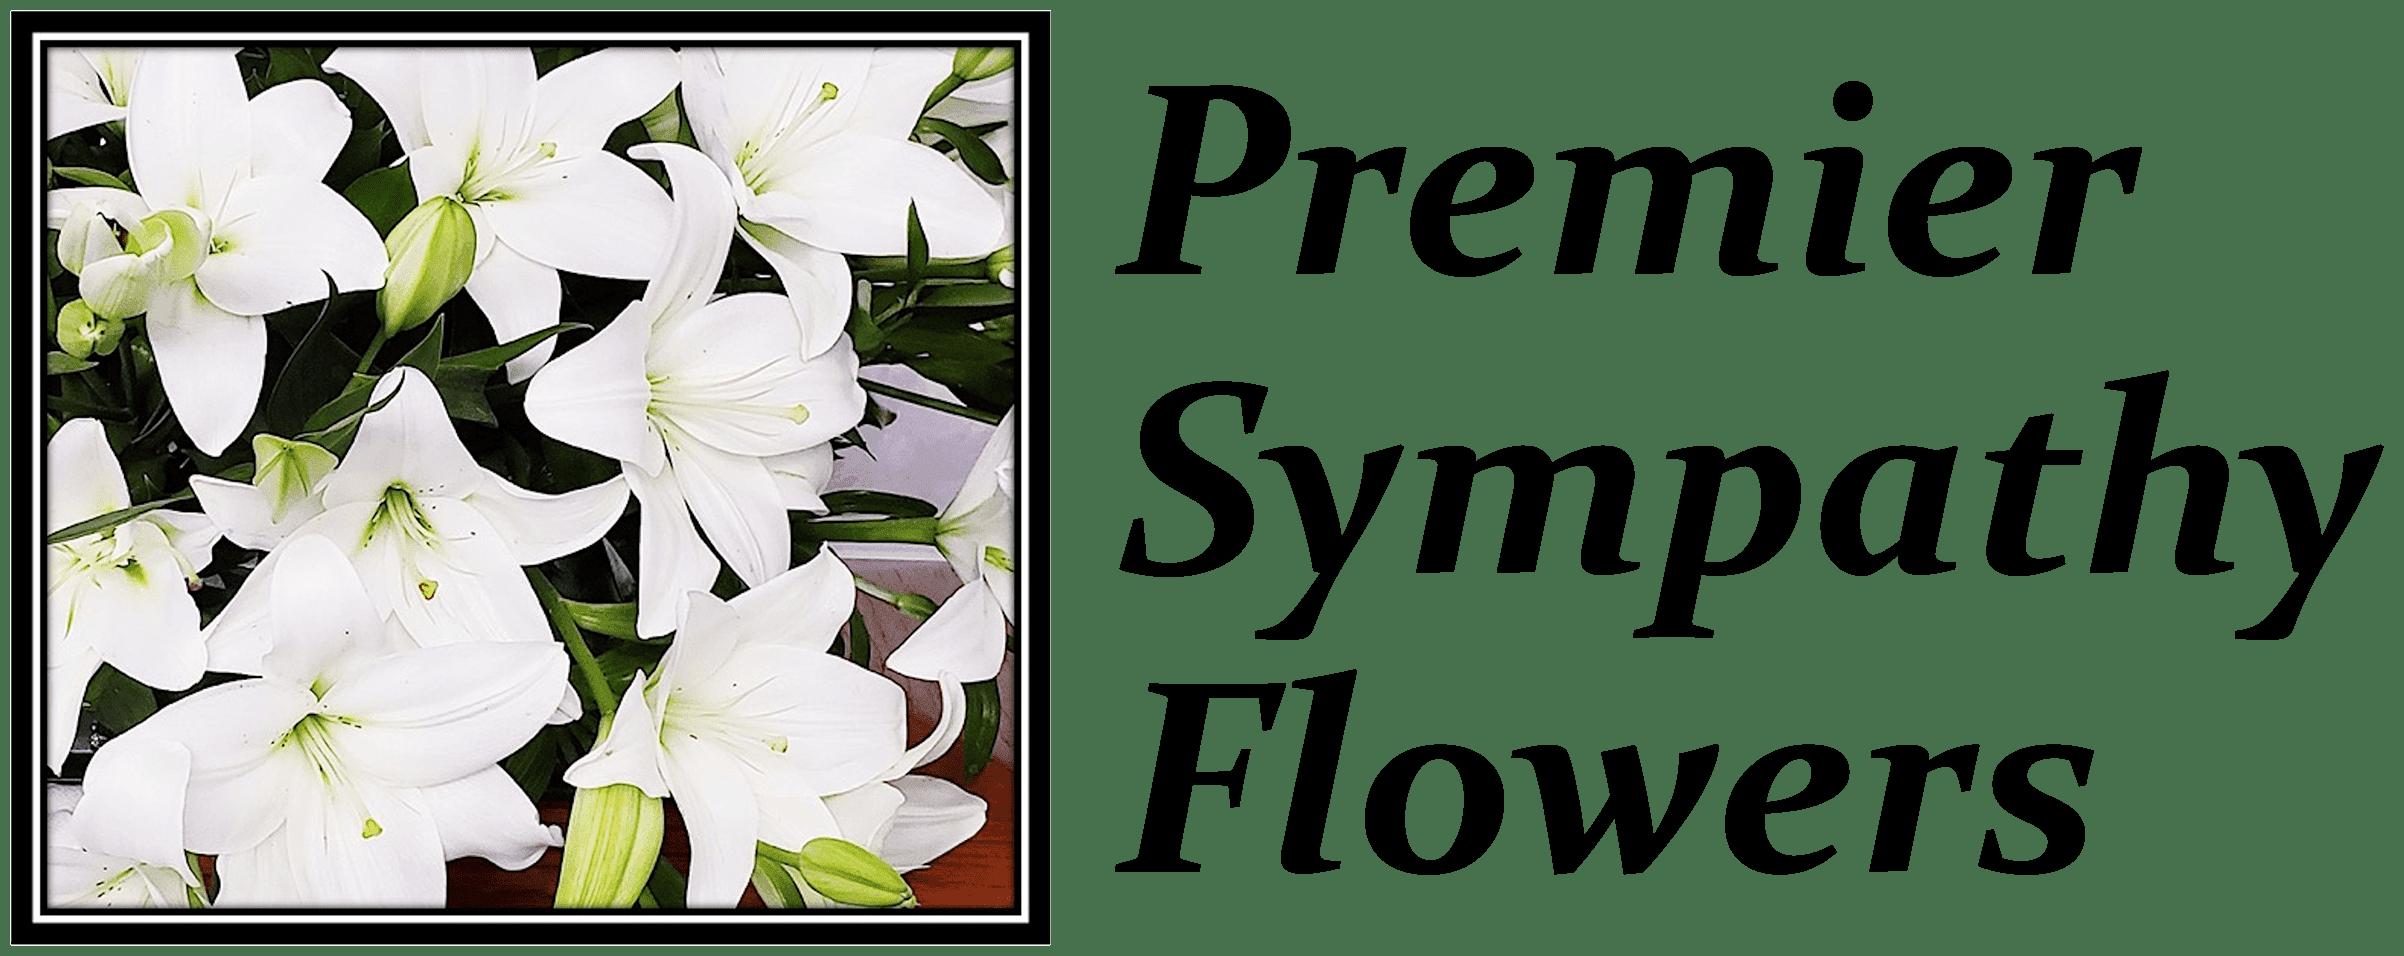 Premier Sympathy Flowers - DAY - Kettering, OH florist